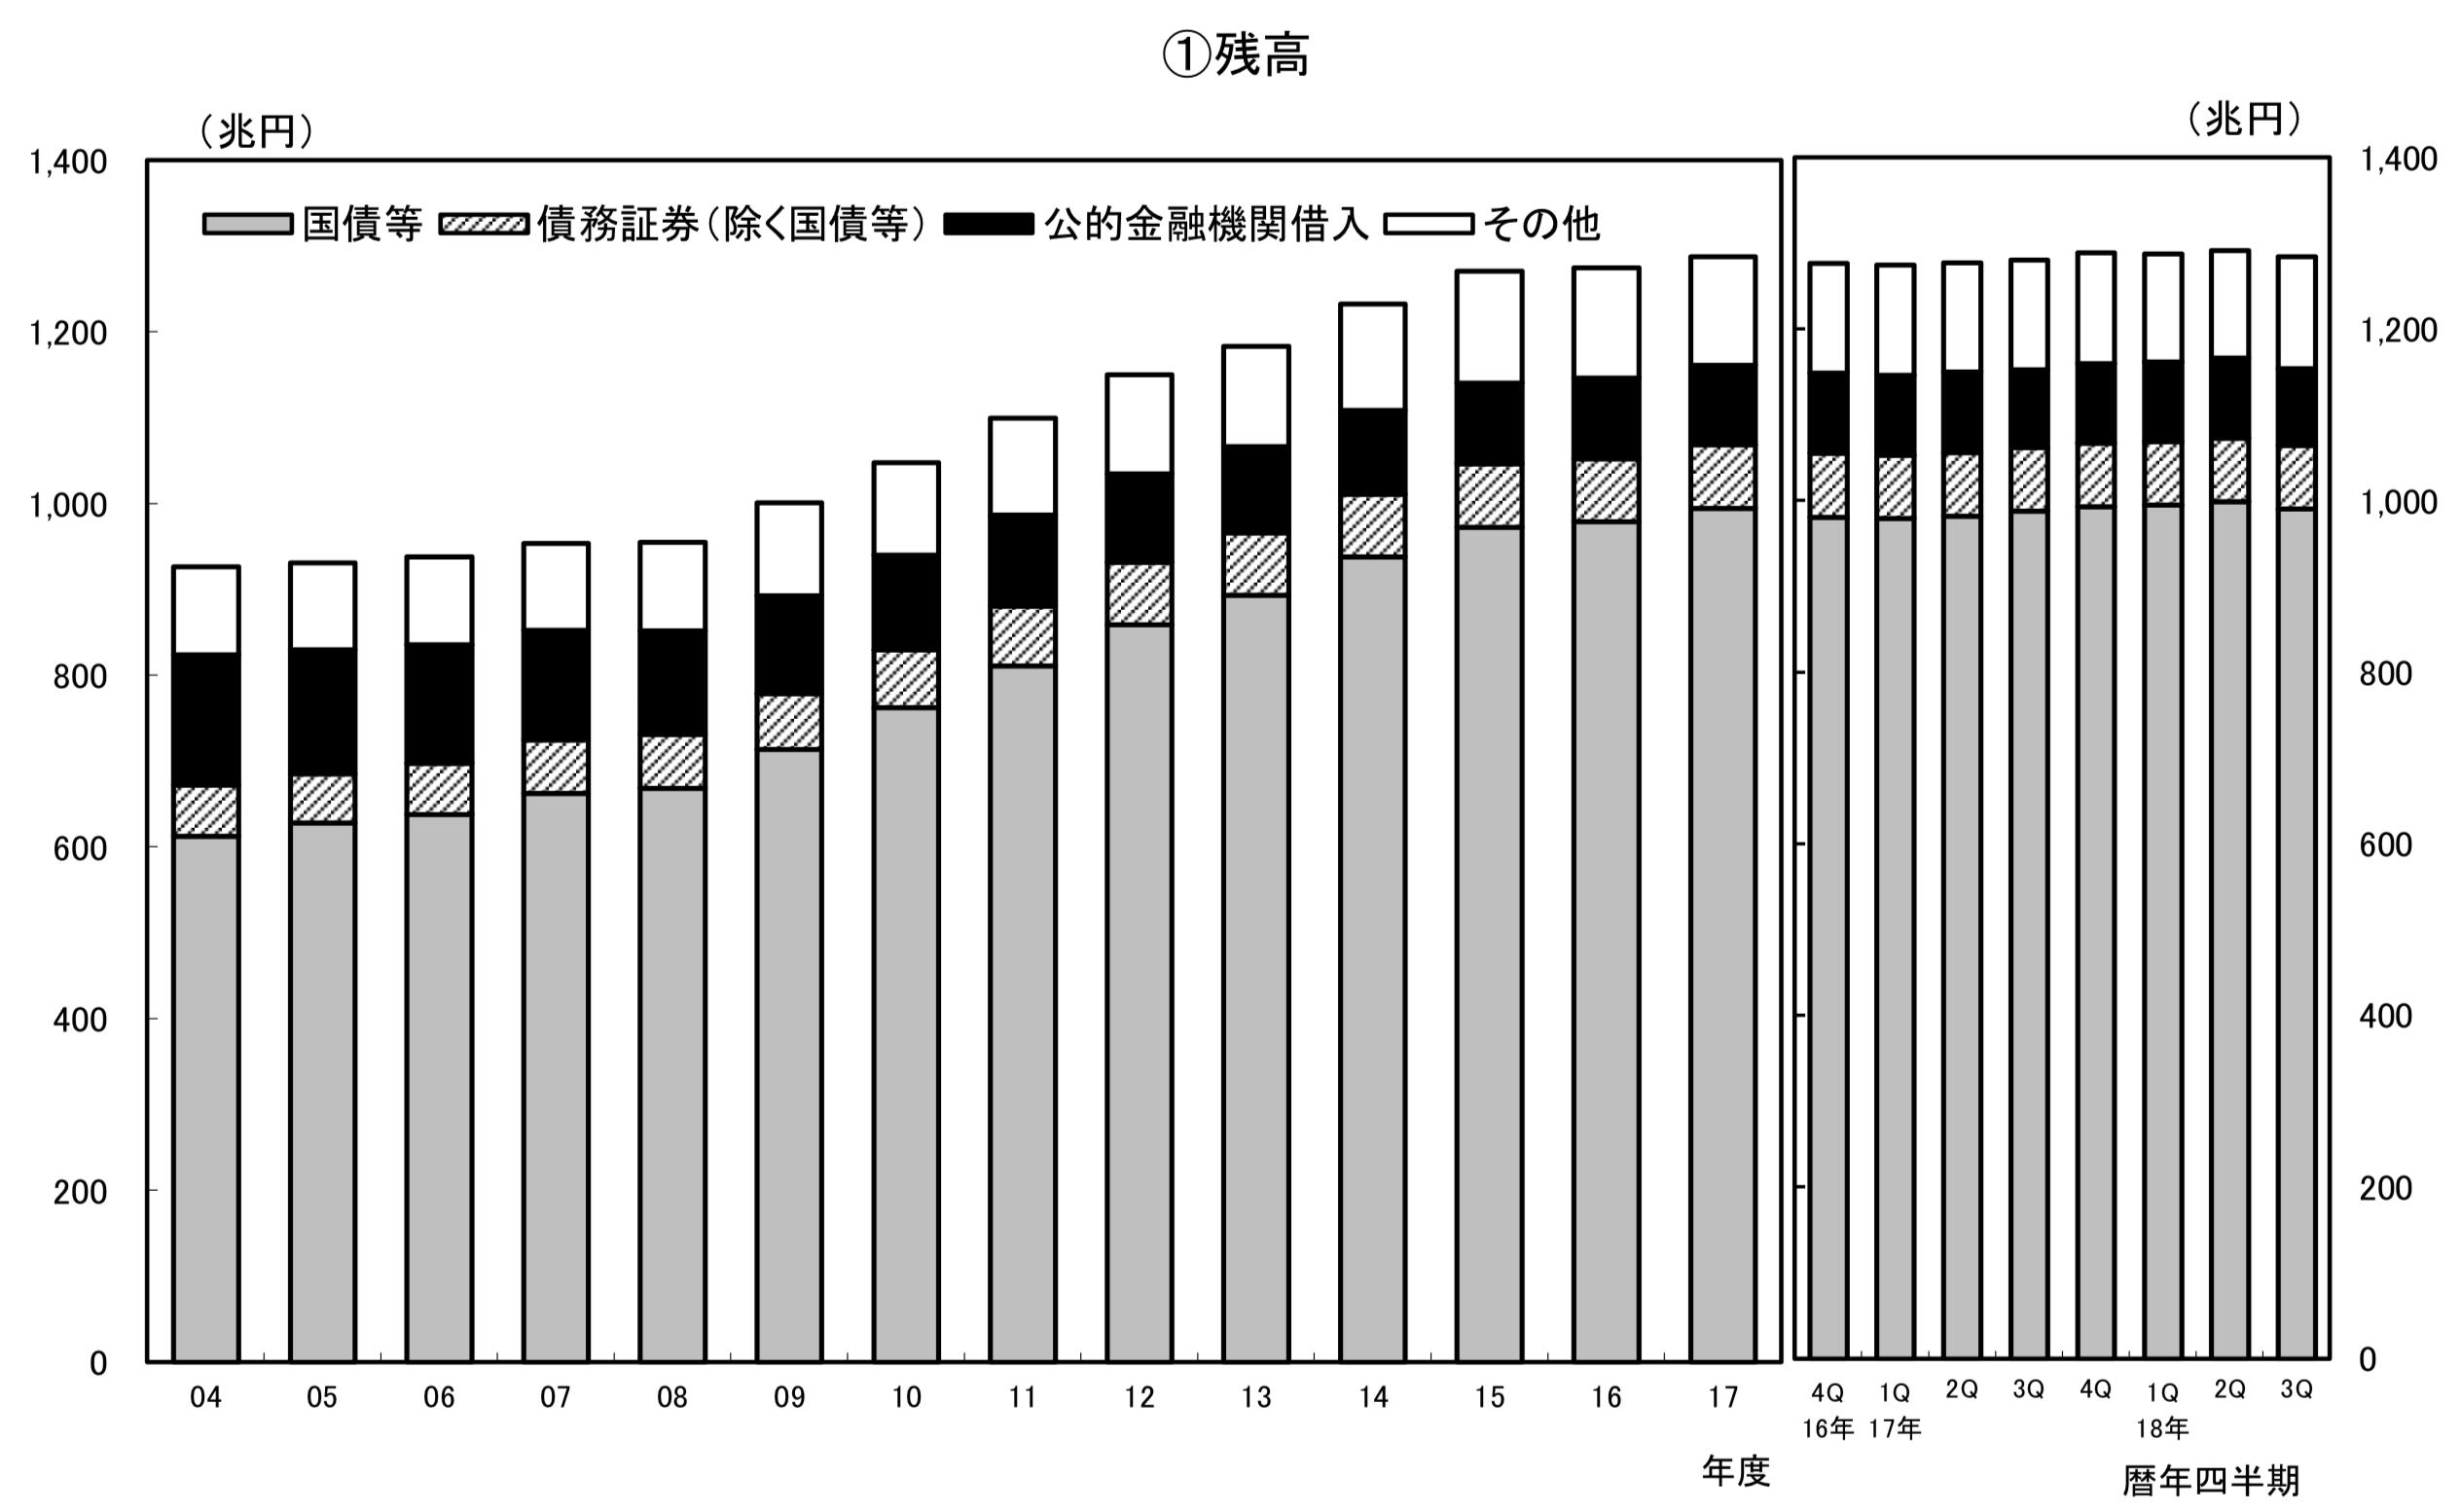 日本政府の債務残高